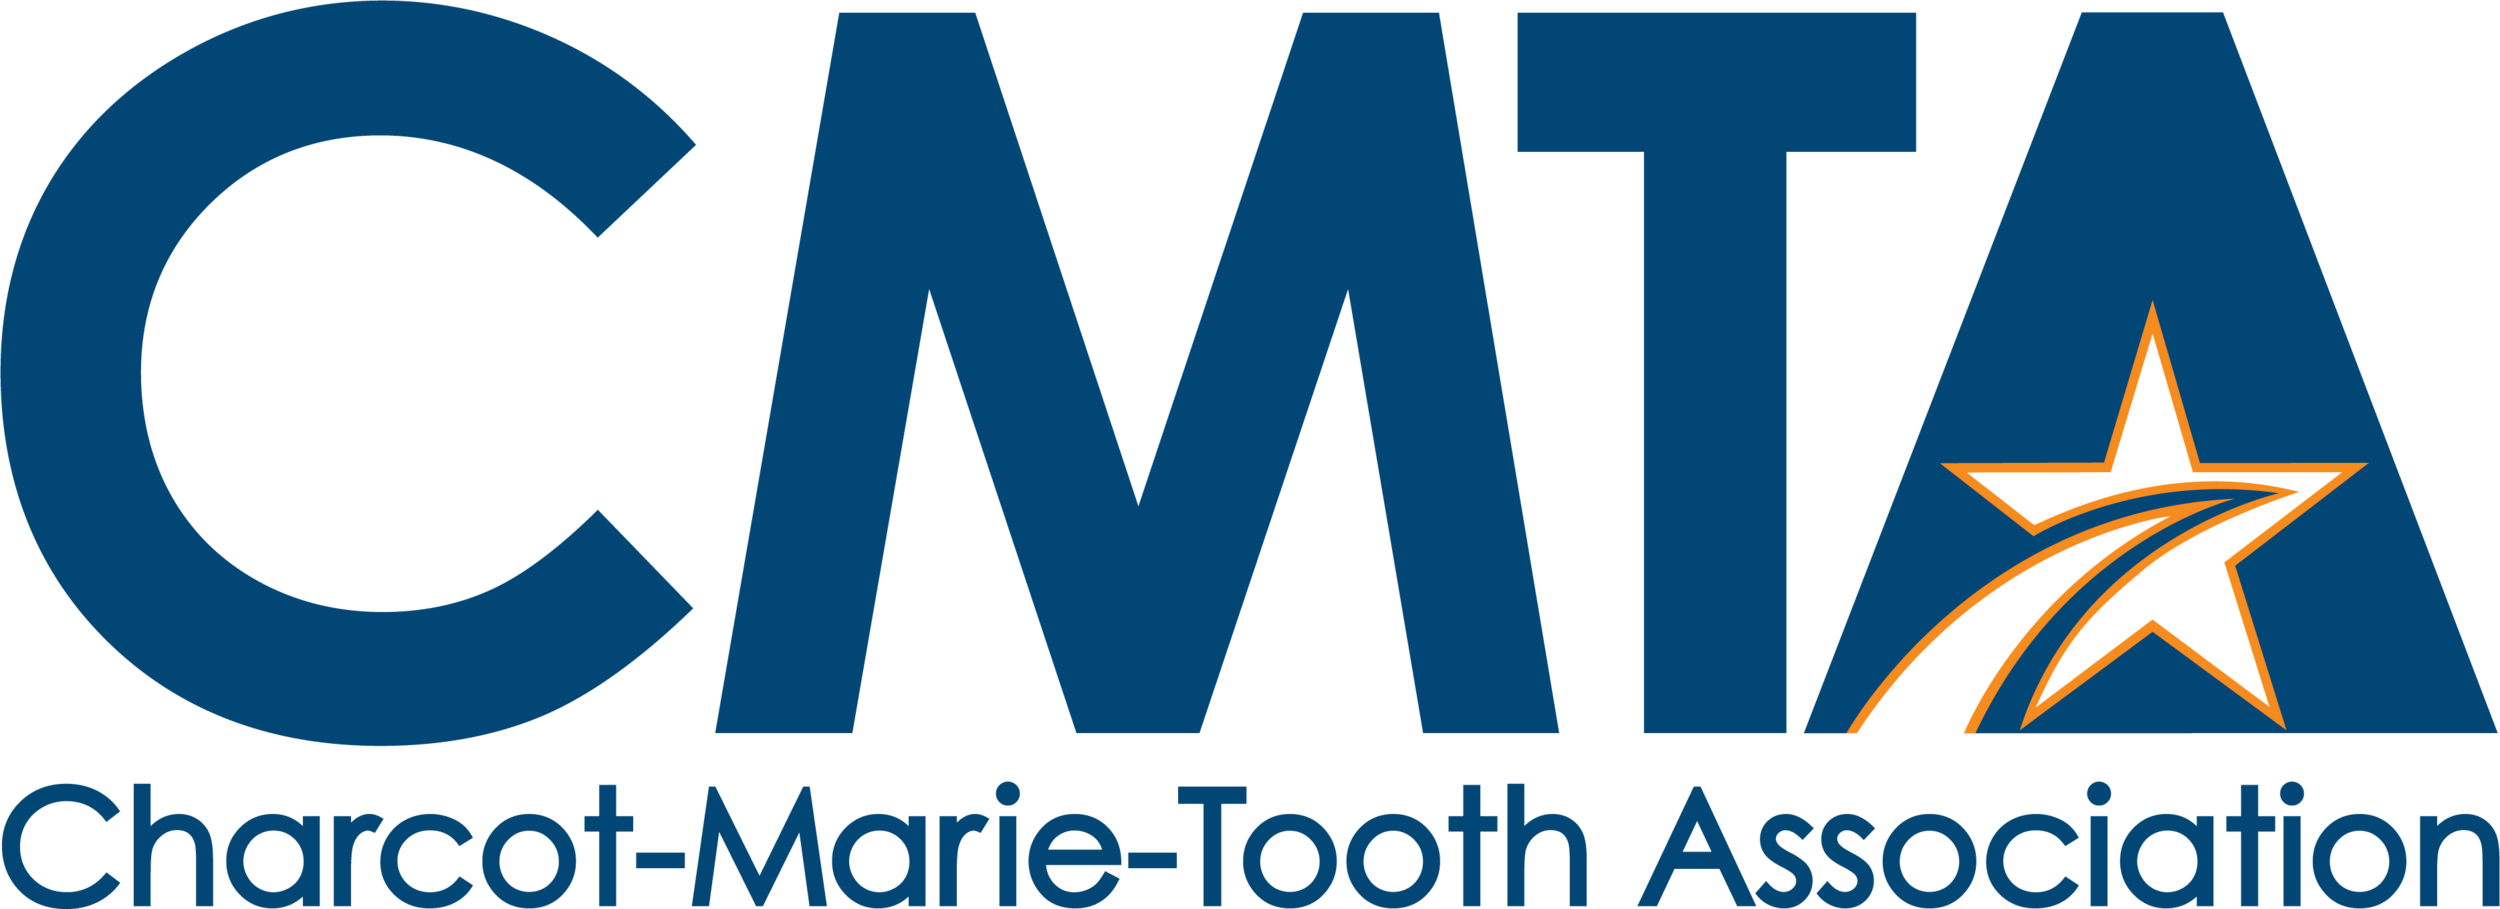 WaYFDMiFwRBlPf3n-2019-CMTA-POSITIVE-Logo.png